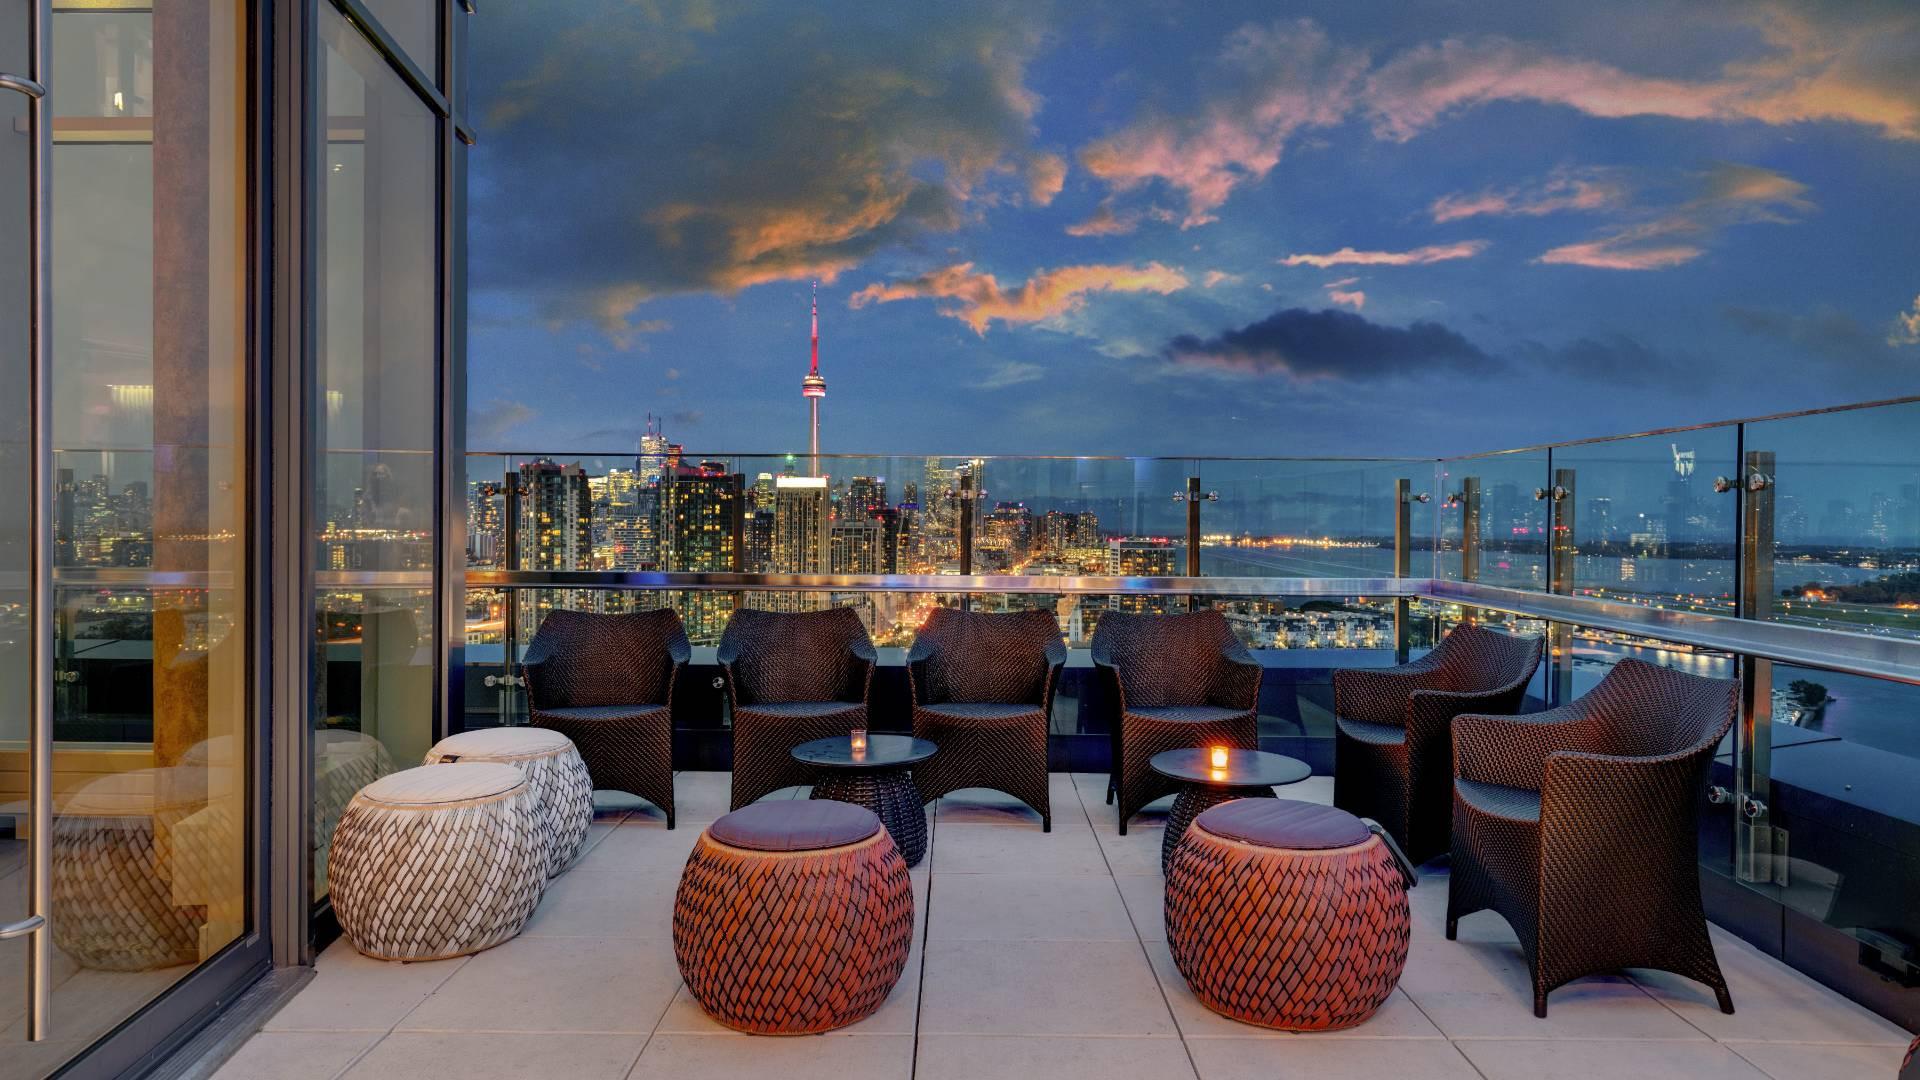 Best hotels Toronto staycation | Hotel X rooftop terrace